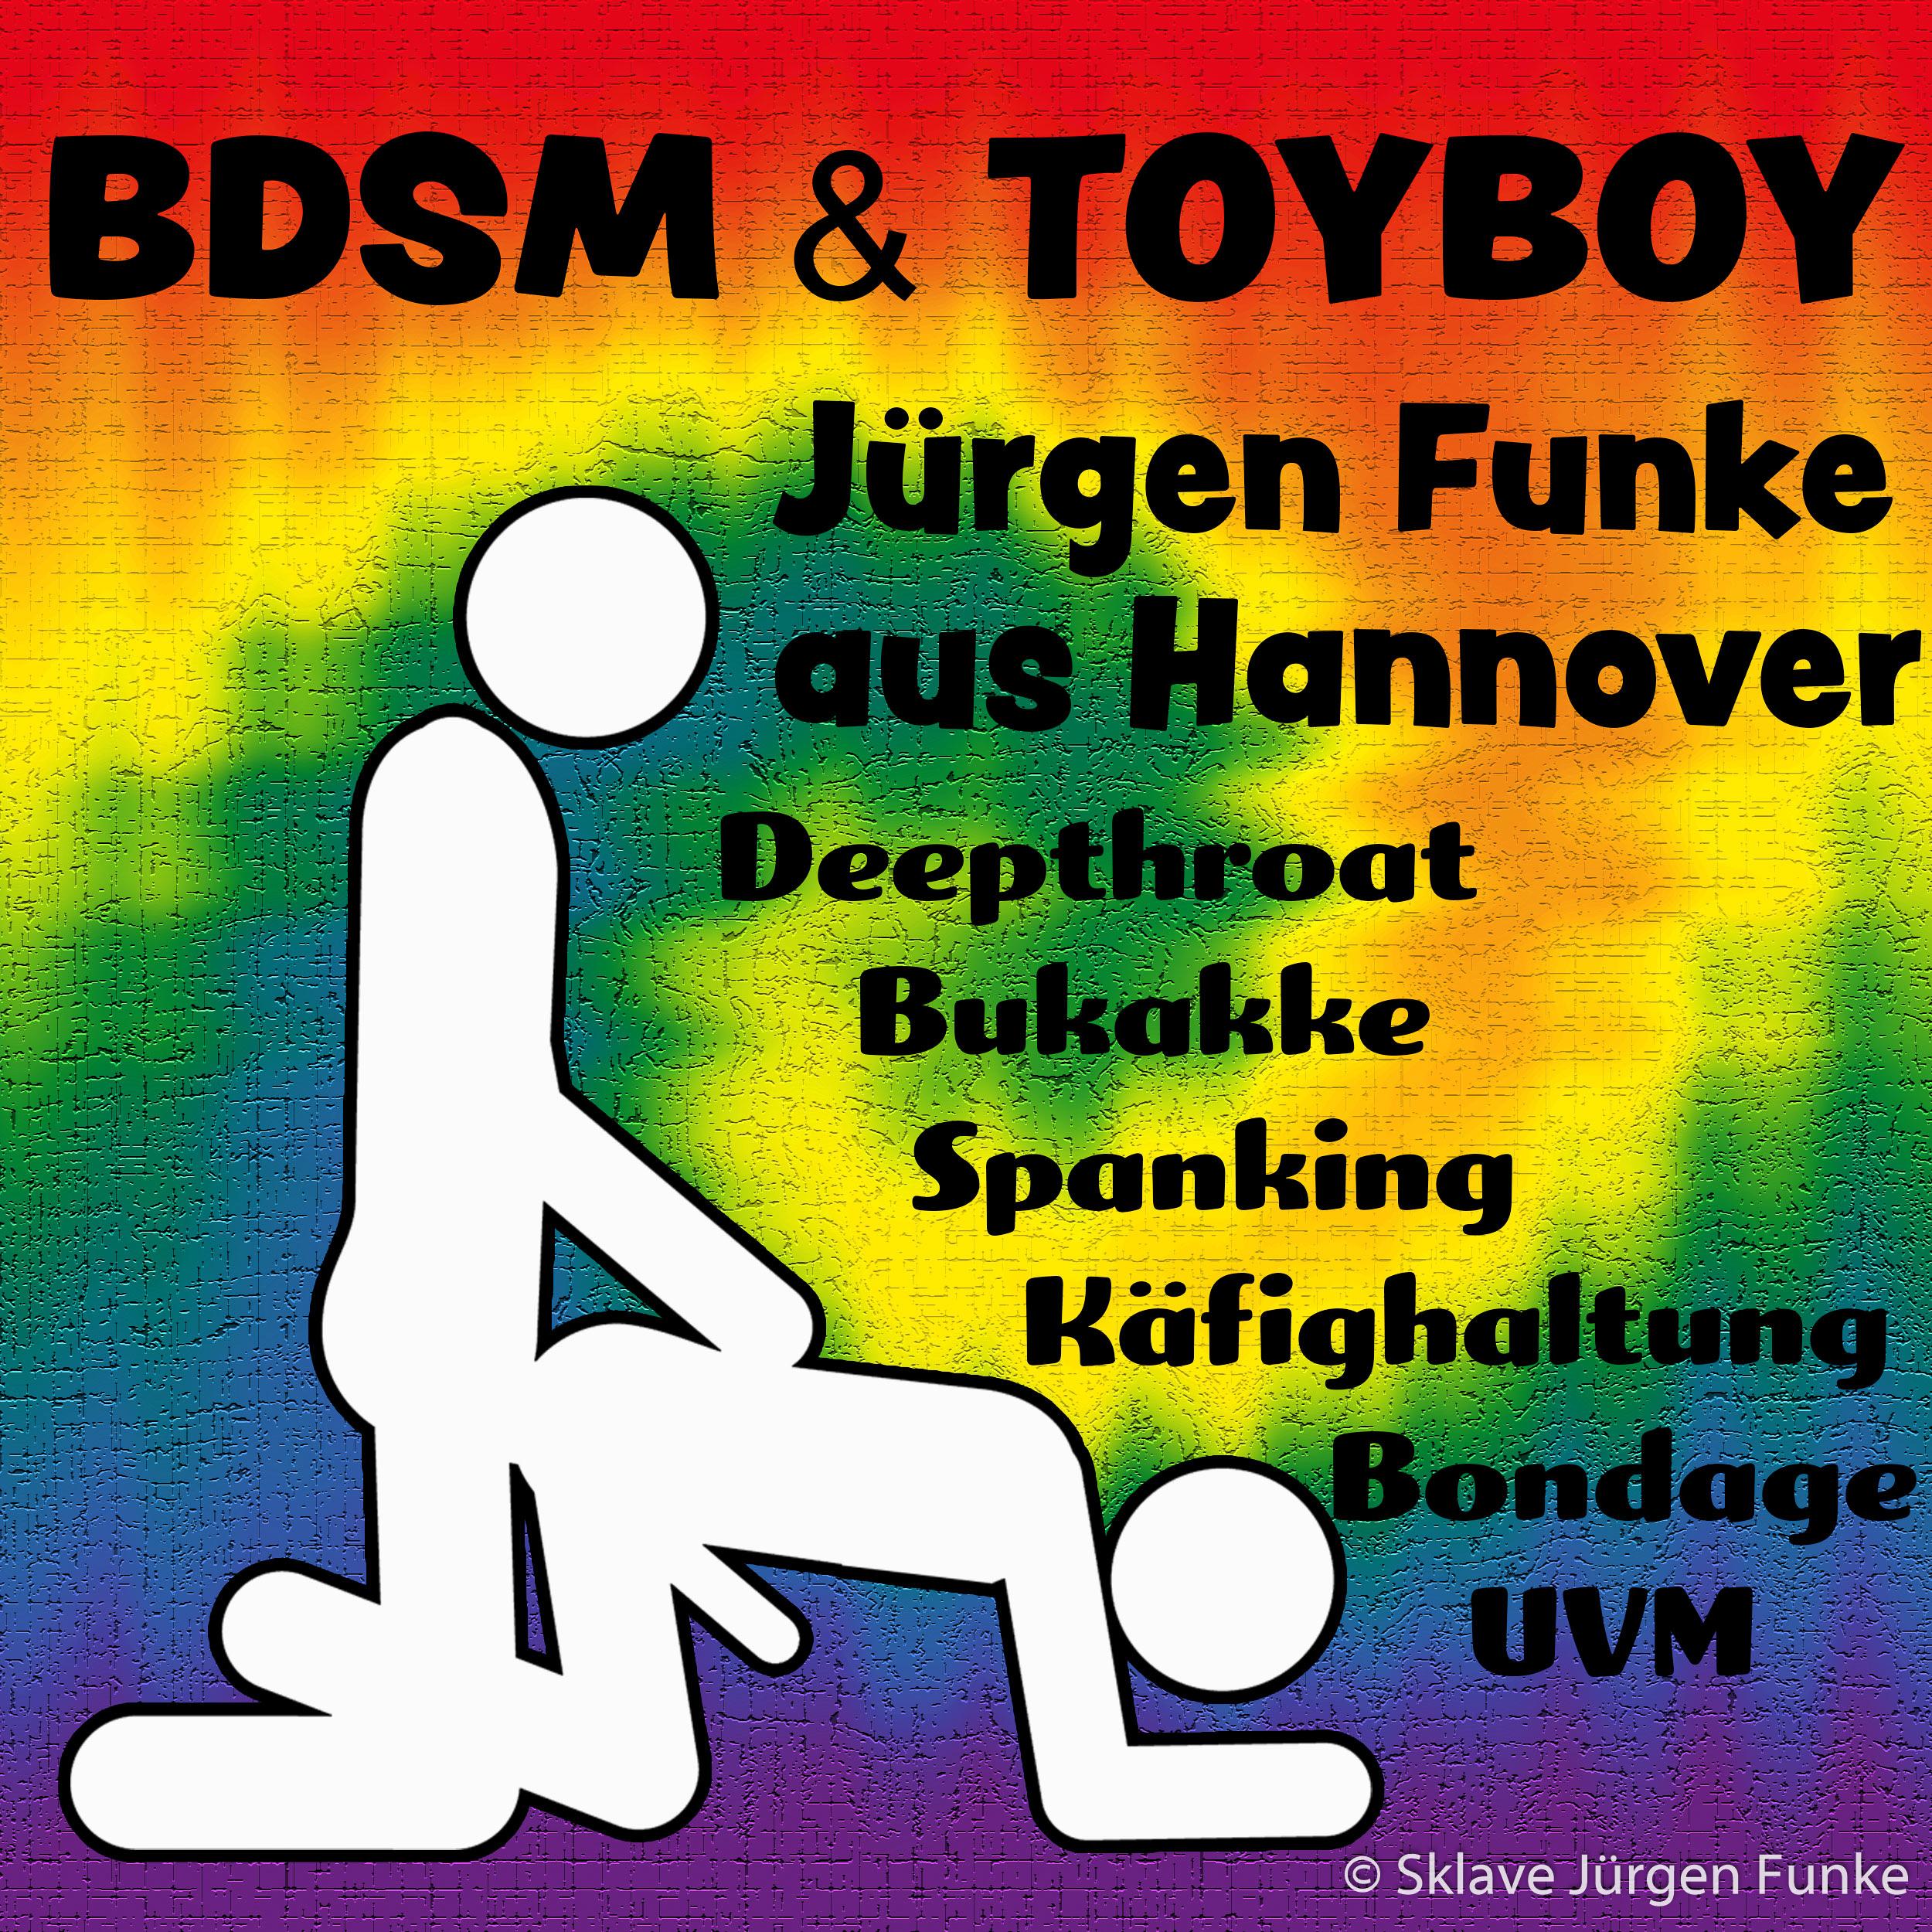 Gay - BDSM - Escort - Jürgen Funke aus Hannover